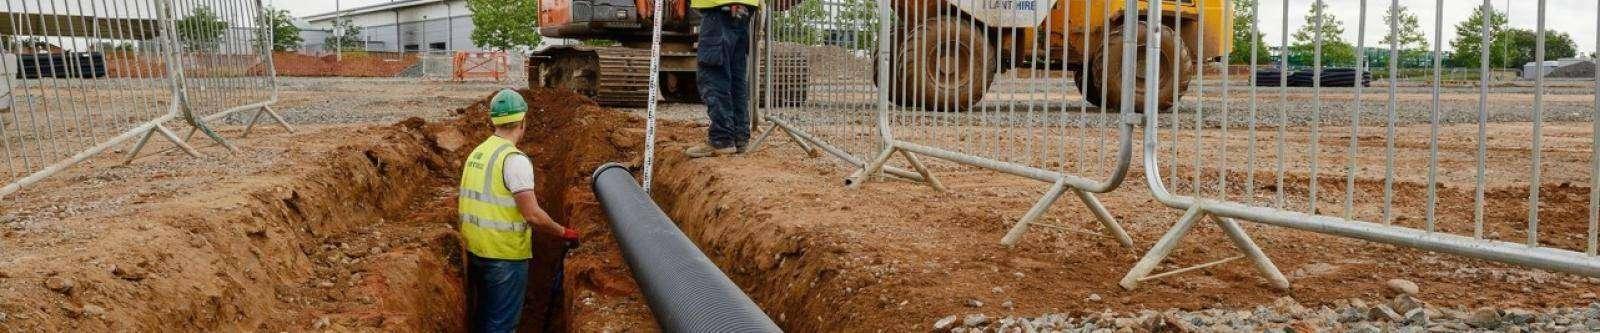 Ridgidrain | Ridgistorm-XL | Surface Water Attenuation |